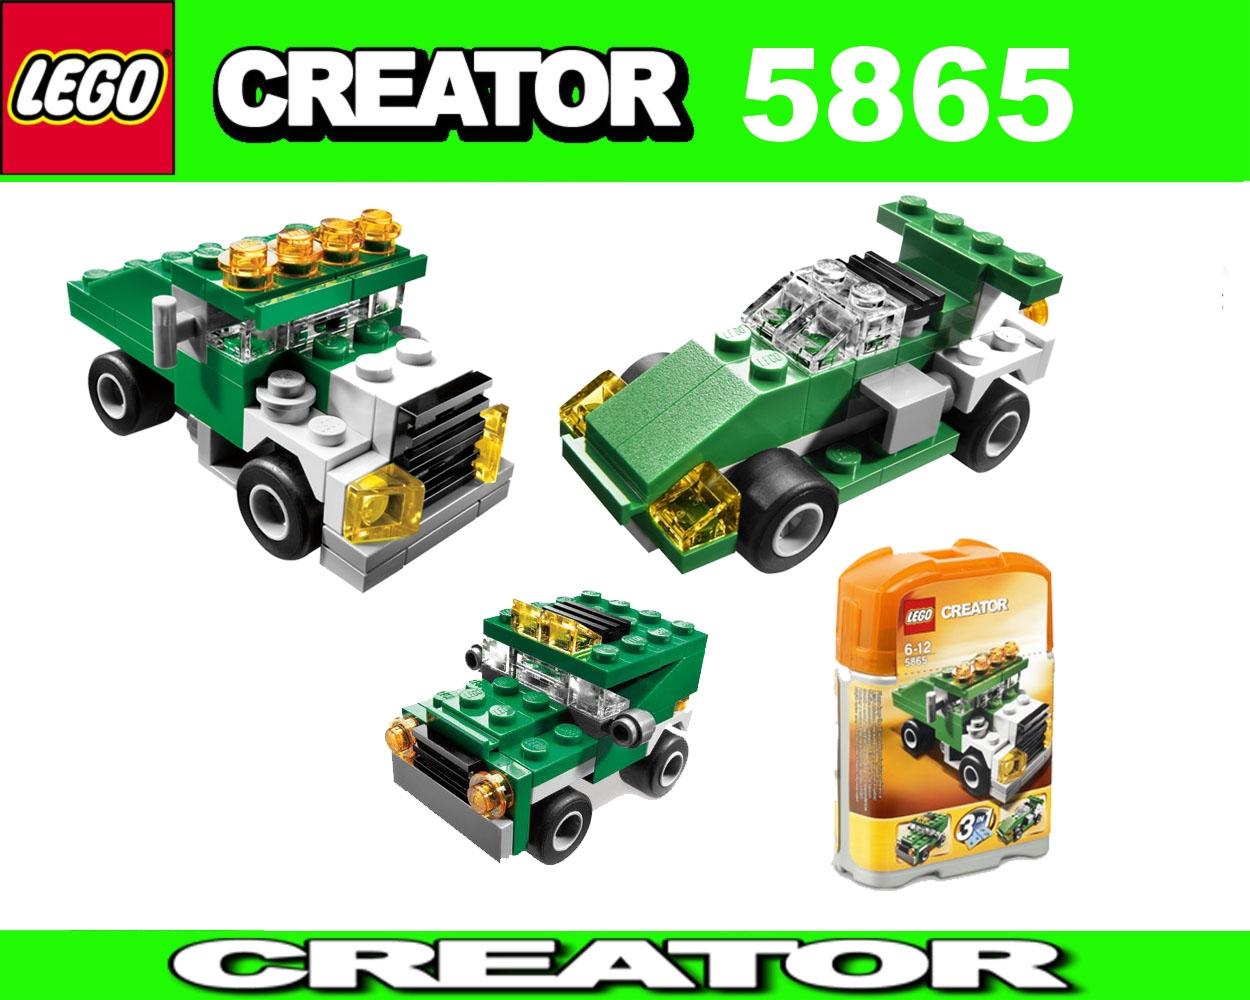 lego creator 5865 3in1 mini laster mini dumper vehicle. Black Bedroom Furniture Sets. Home Design Ideas